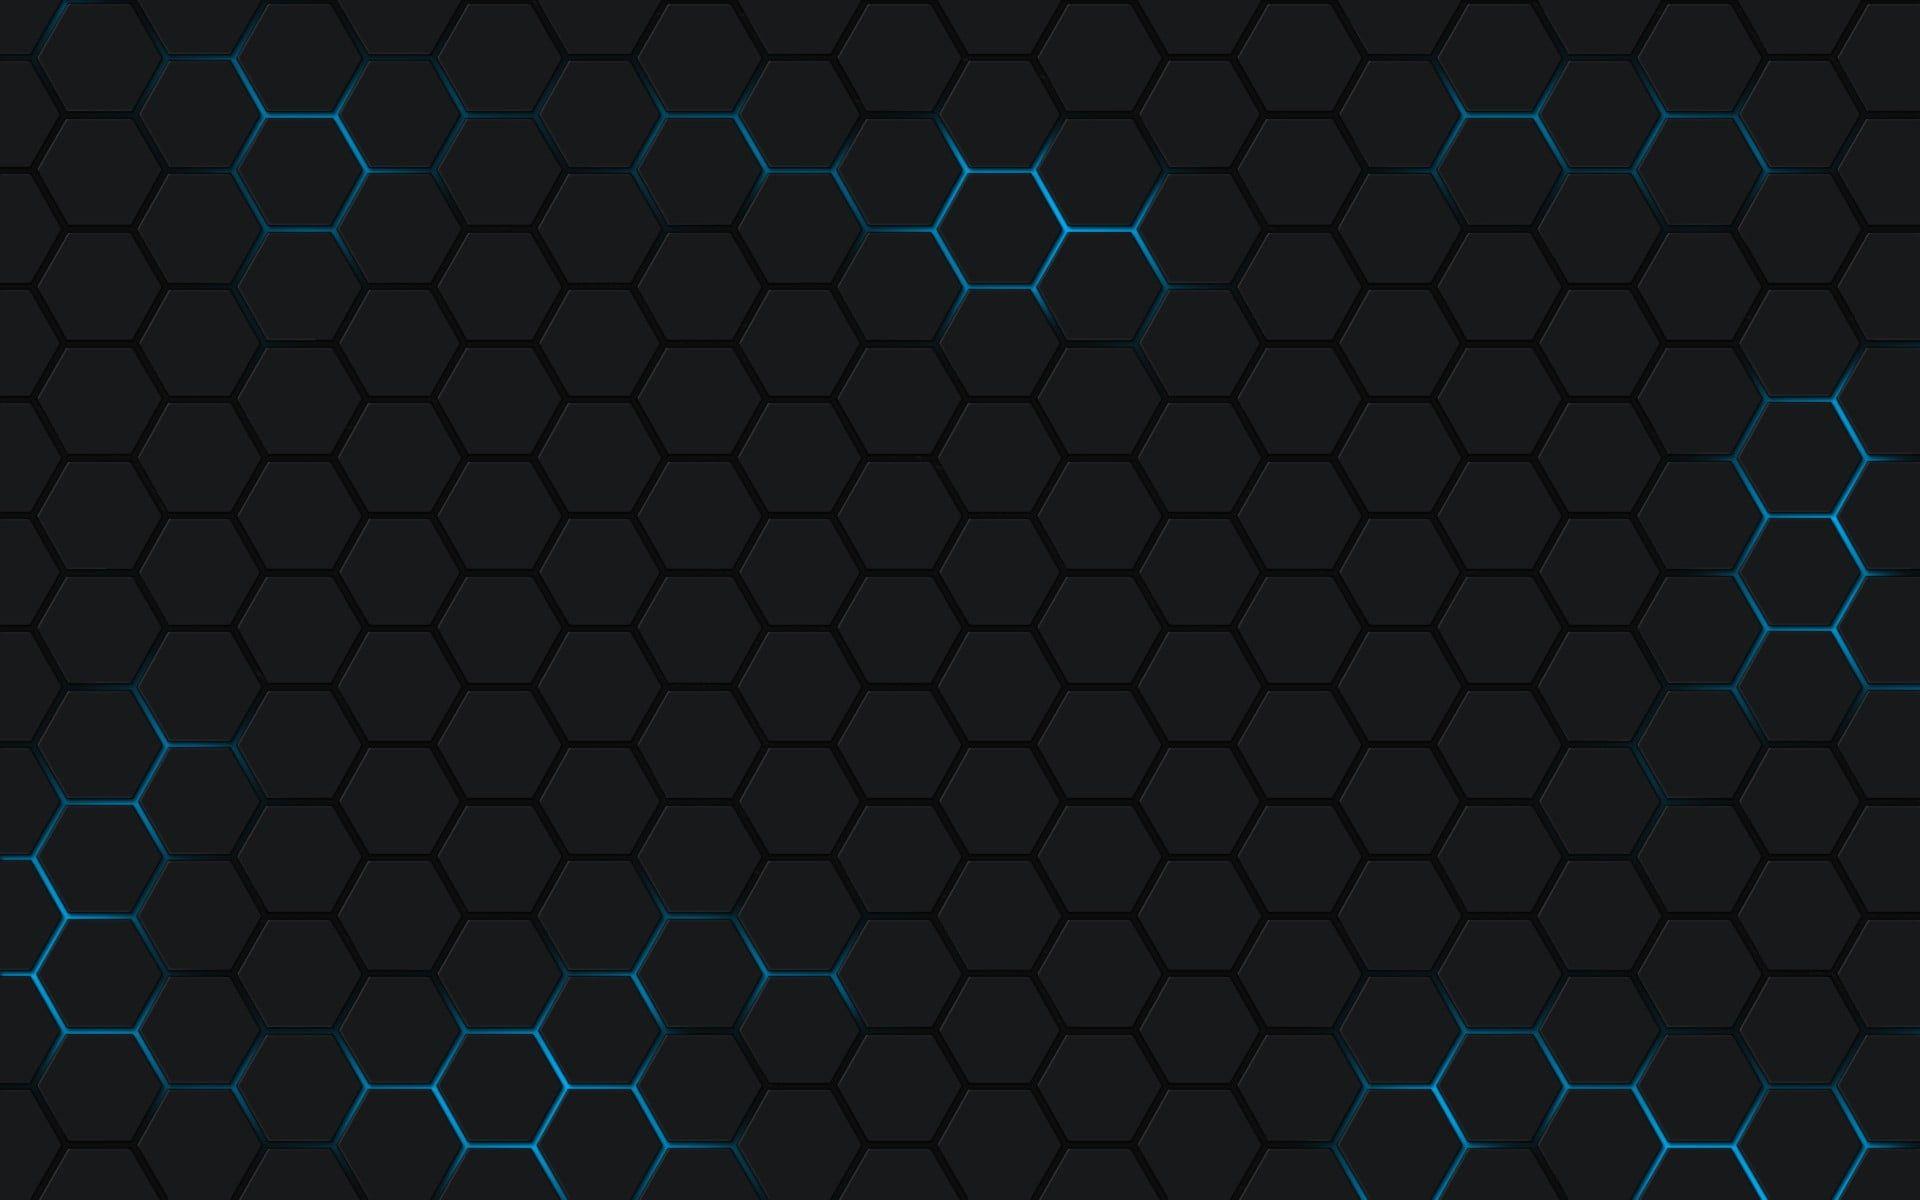 Black Honeycomb Wallpaper Minimalism Hexagon 1080p Wallpaper Hdwallpaper Desktop Lenovo Wallpapers Hexagon Wallpaper Honeycomb Wallpaper